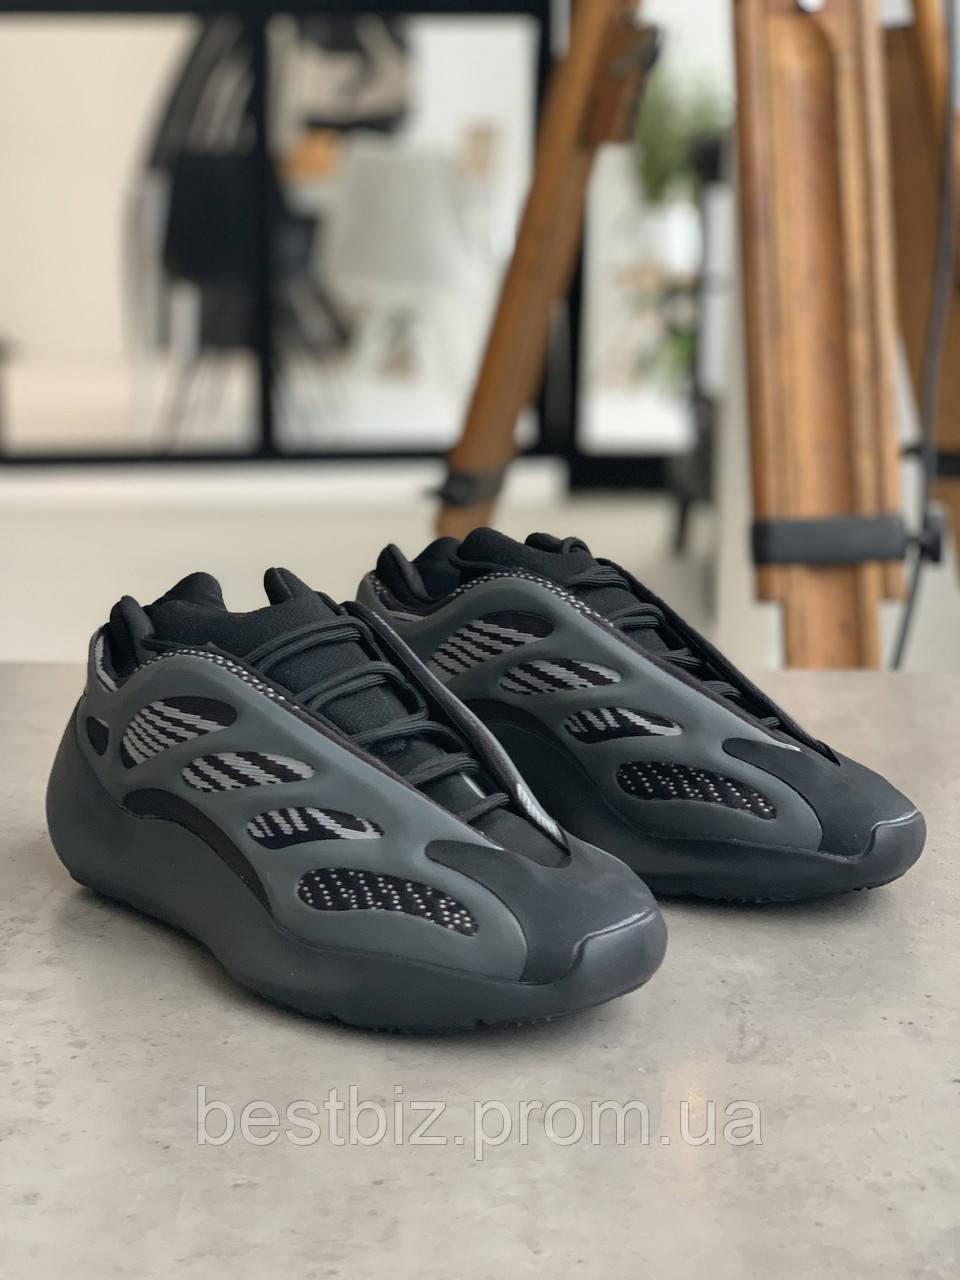 Кросівки Adidas Yeezy Boost 700 V3 Адідас Ізі Буст (41,43,44,45) репліка